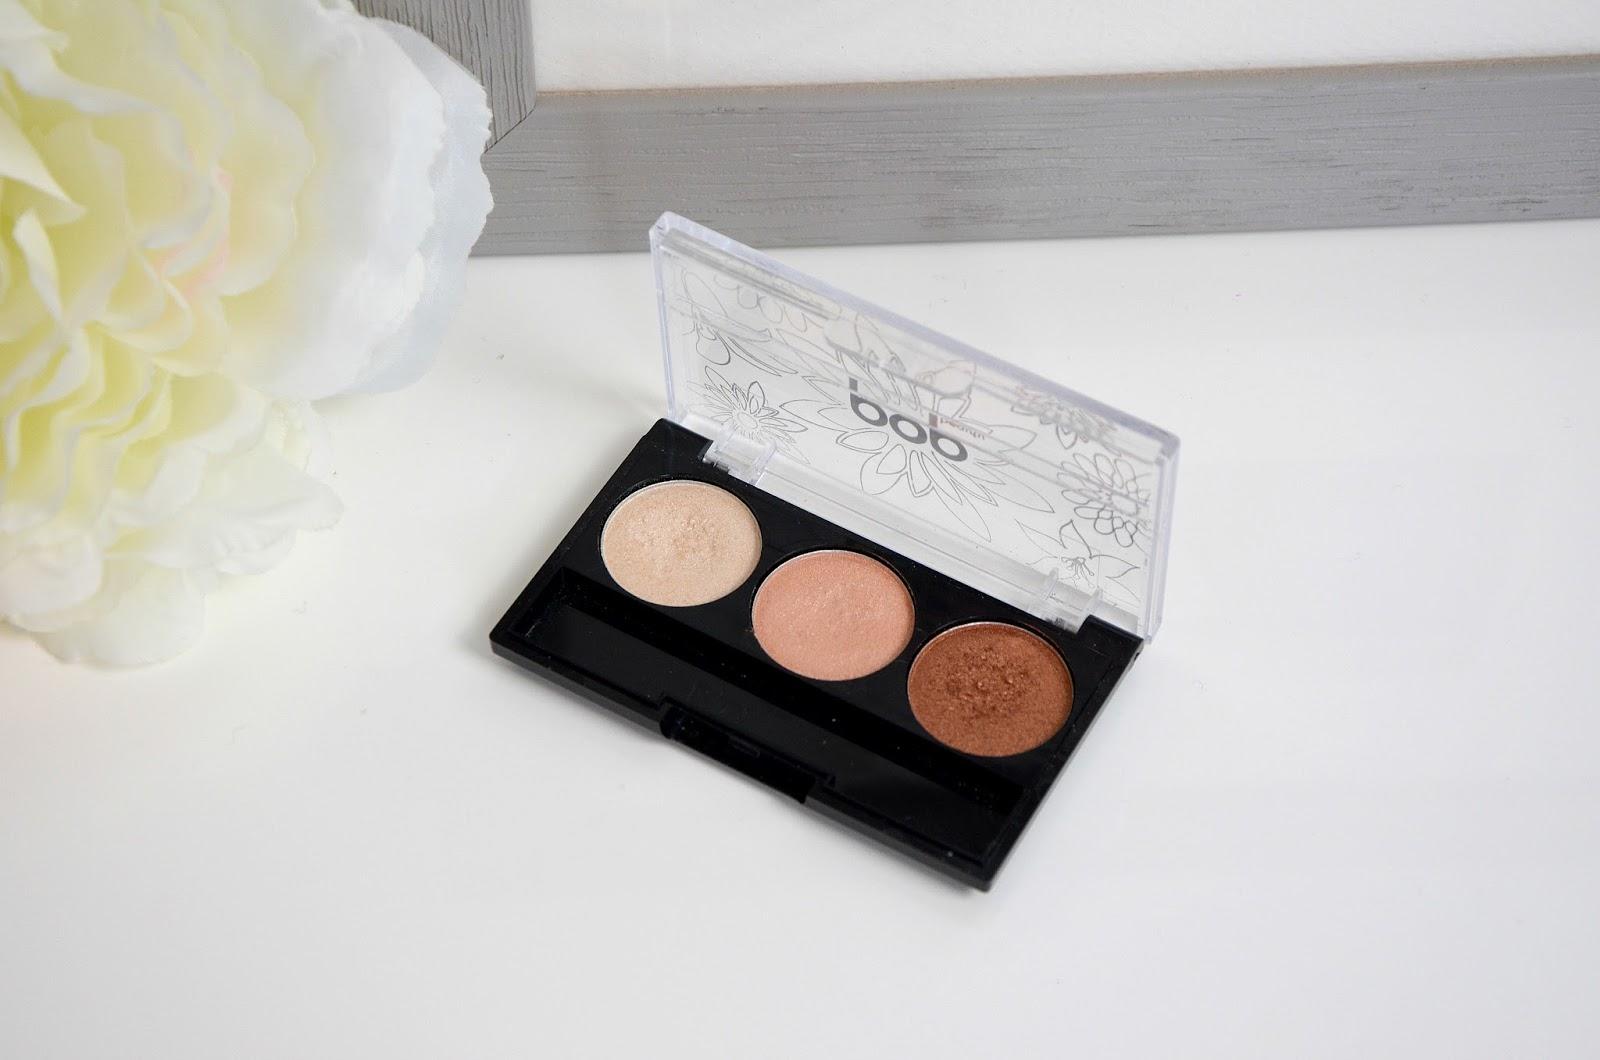 pop beauty bright up your life eye shadow trio peach parfait palette